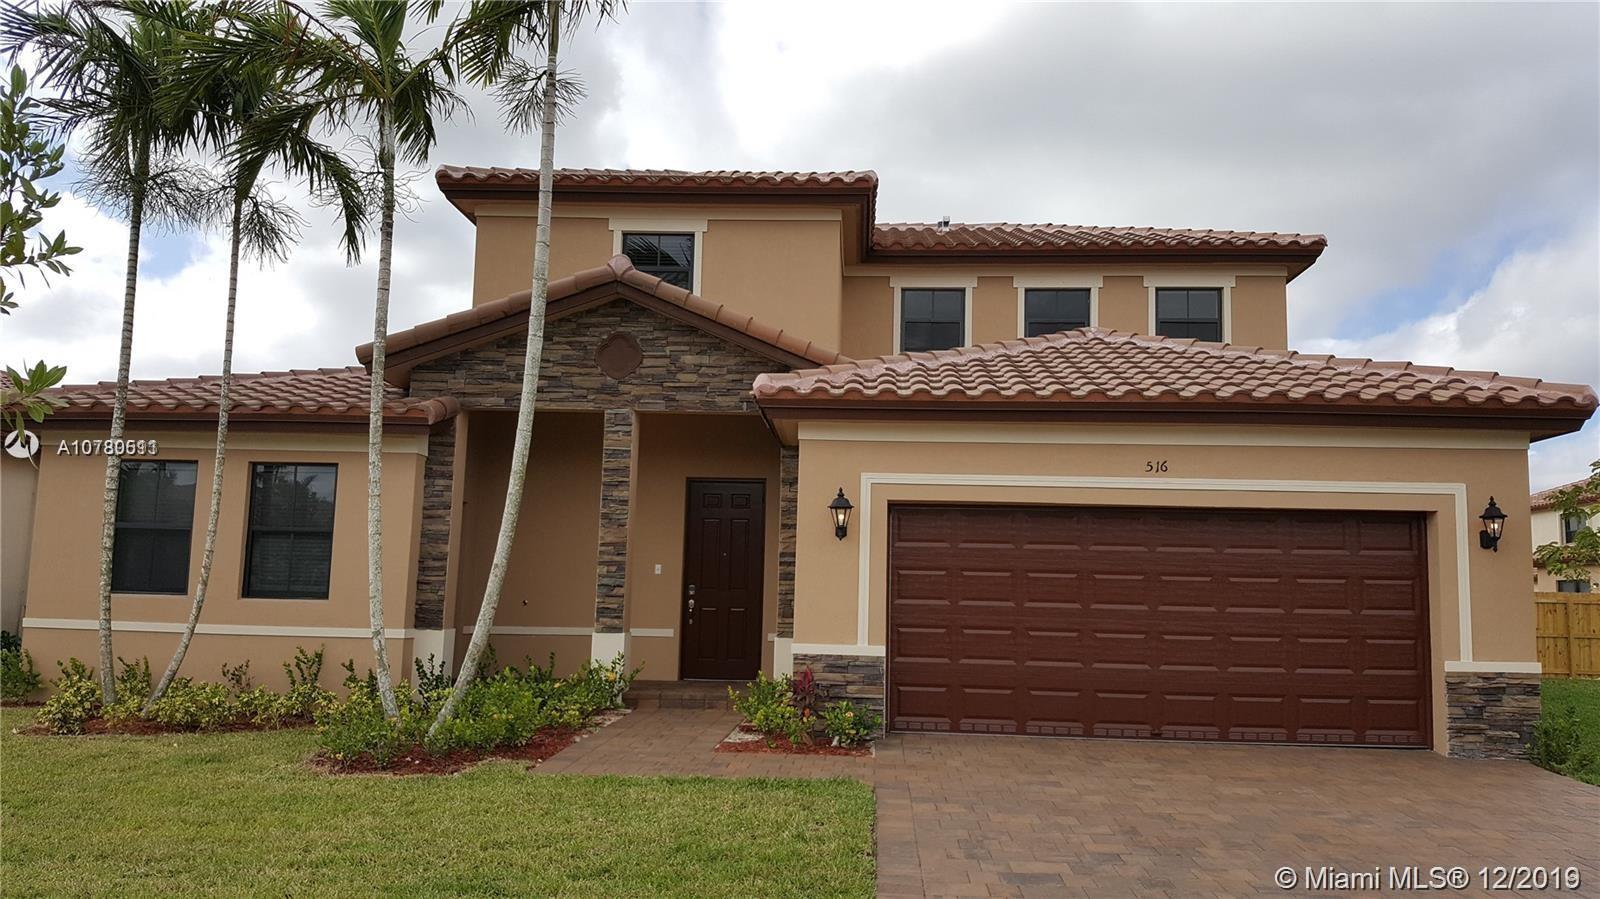 516 SE 35th Ter, Homestead, FL 33033 - Homestead, FL real estate listing